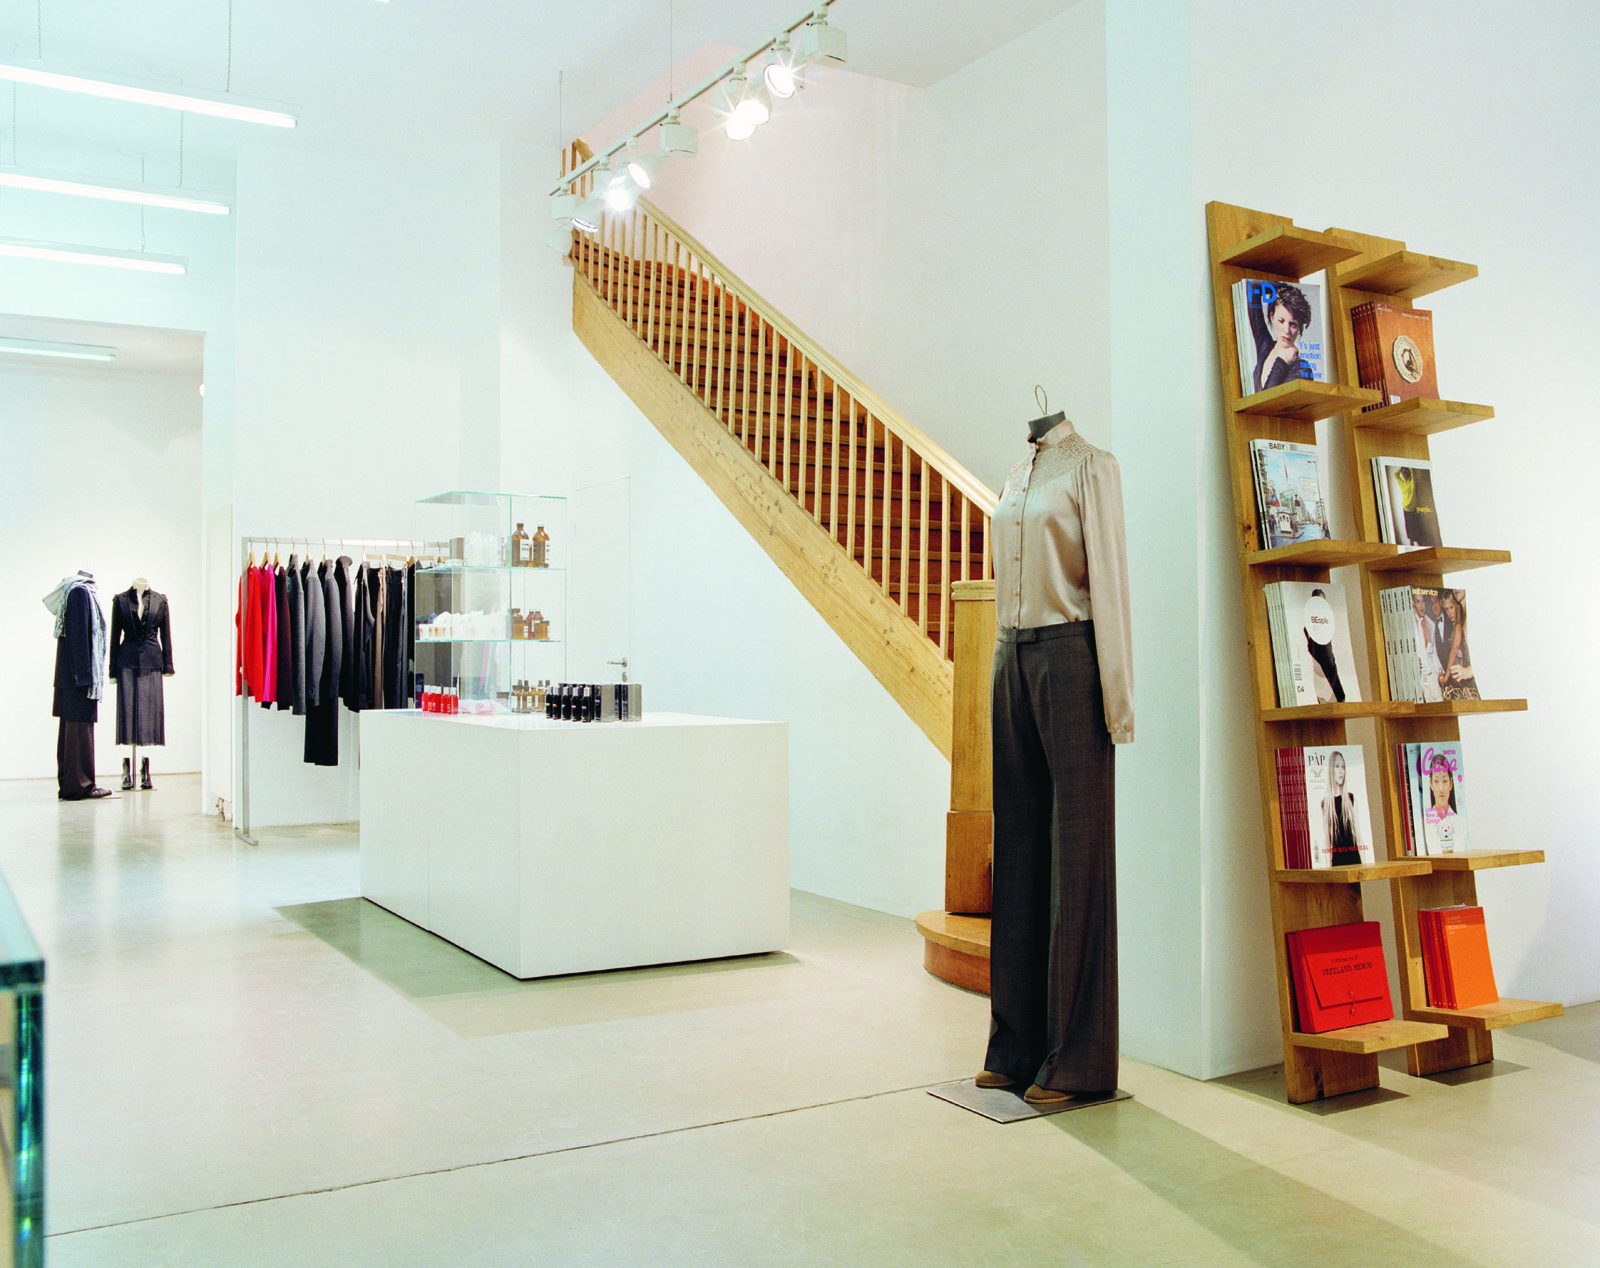 bergman frankfurt am main philipp mainzer. Black Bedroom Furniture Sets. Home Design Ideas